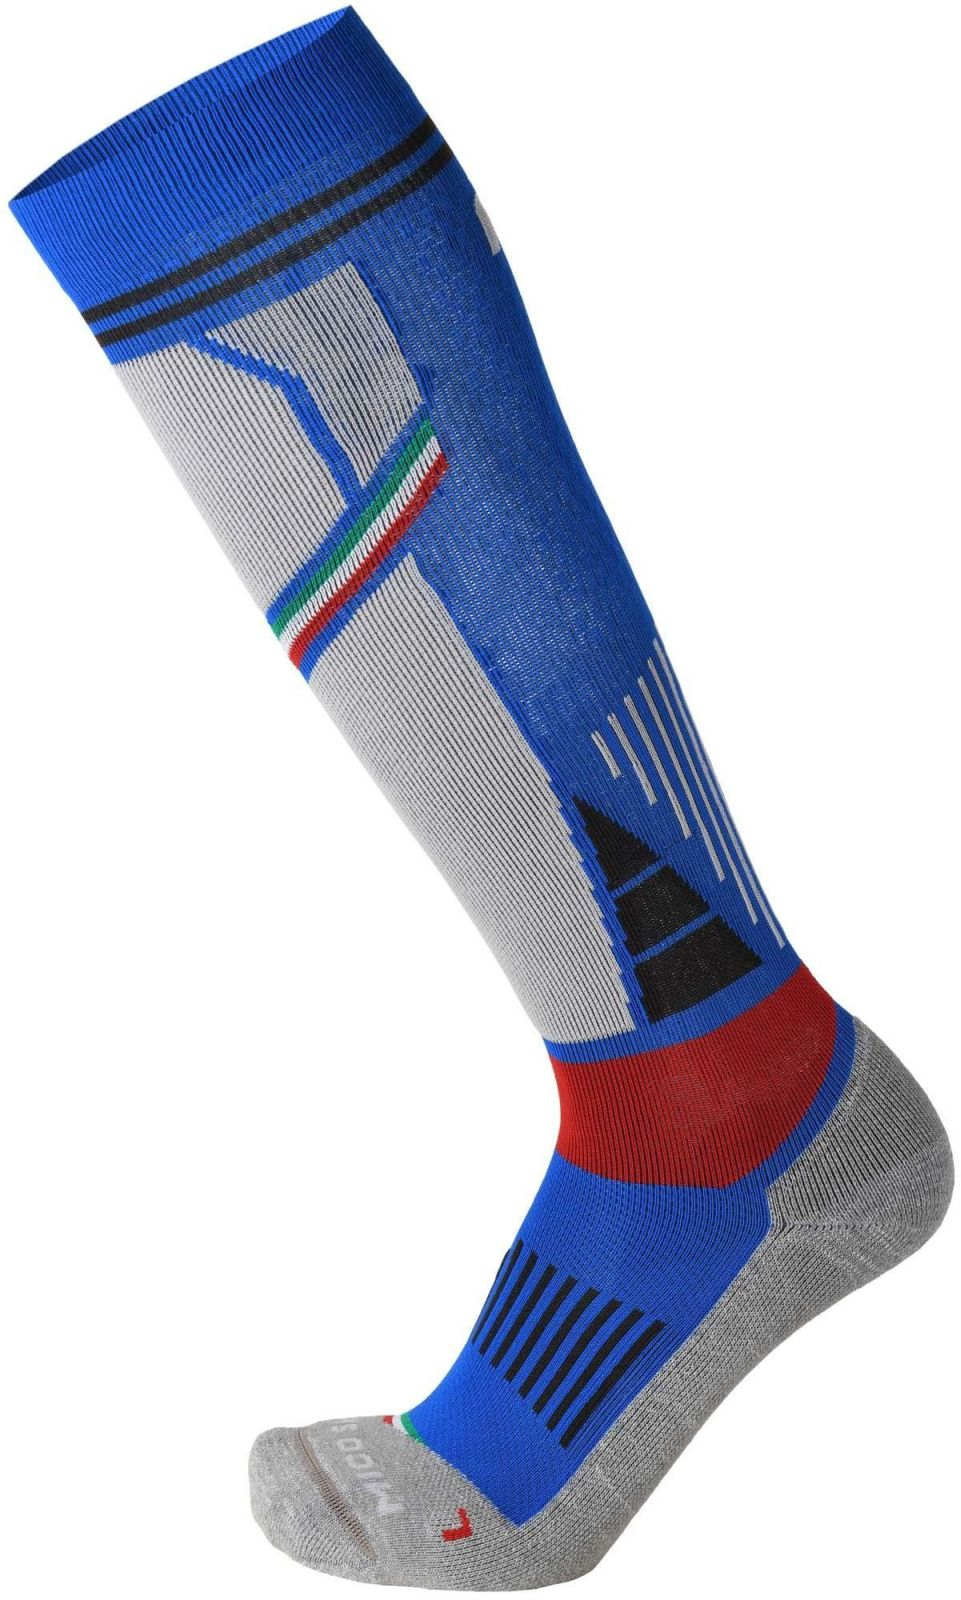 Mico Medium Weight M1 Ski Socks - azzurro/grigio 47-49